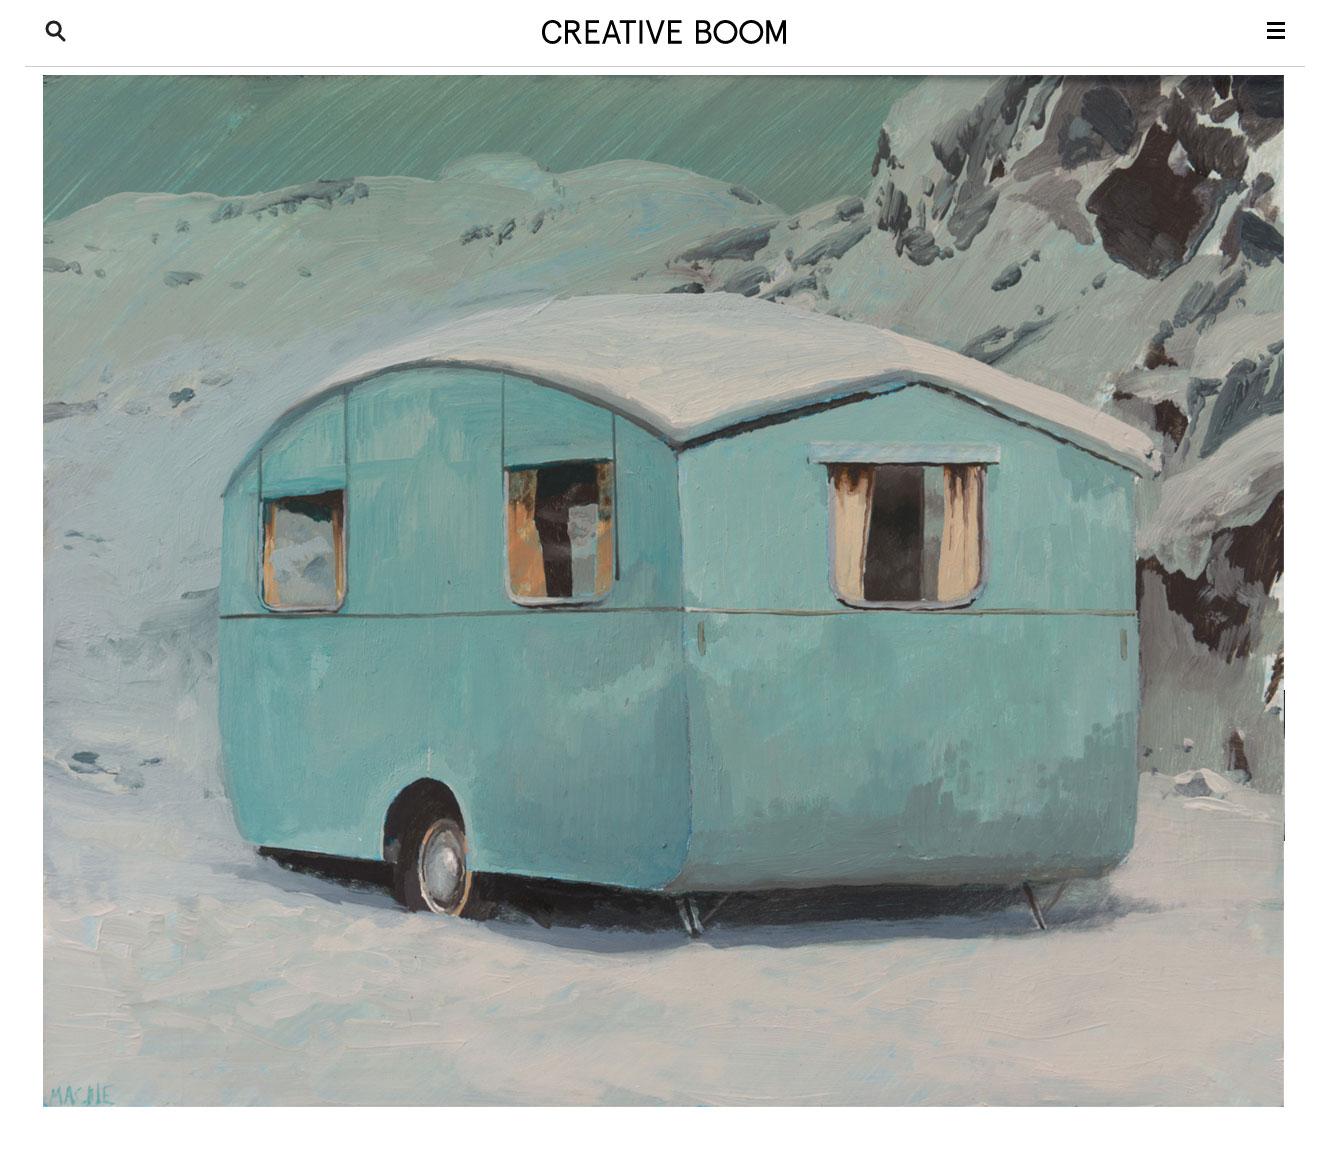 Splendid Isolation: Creative Boom